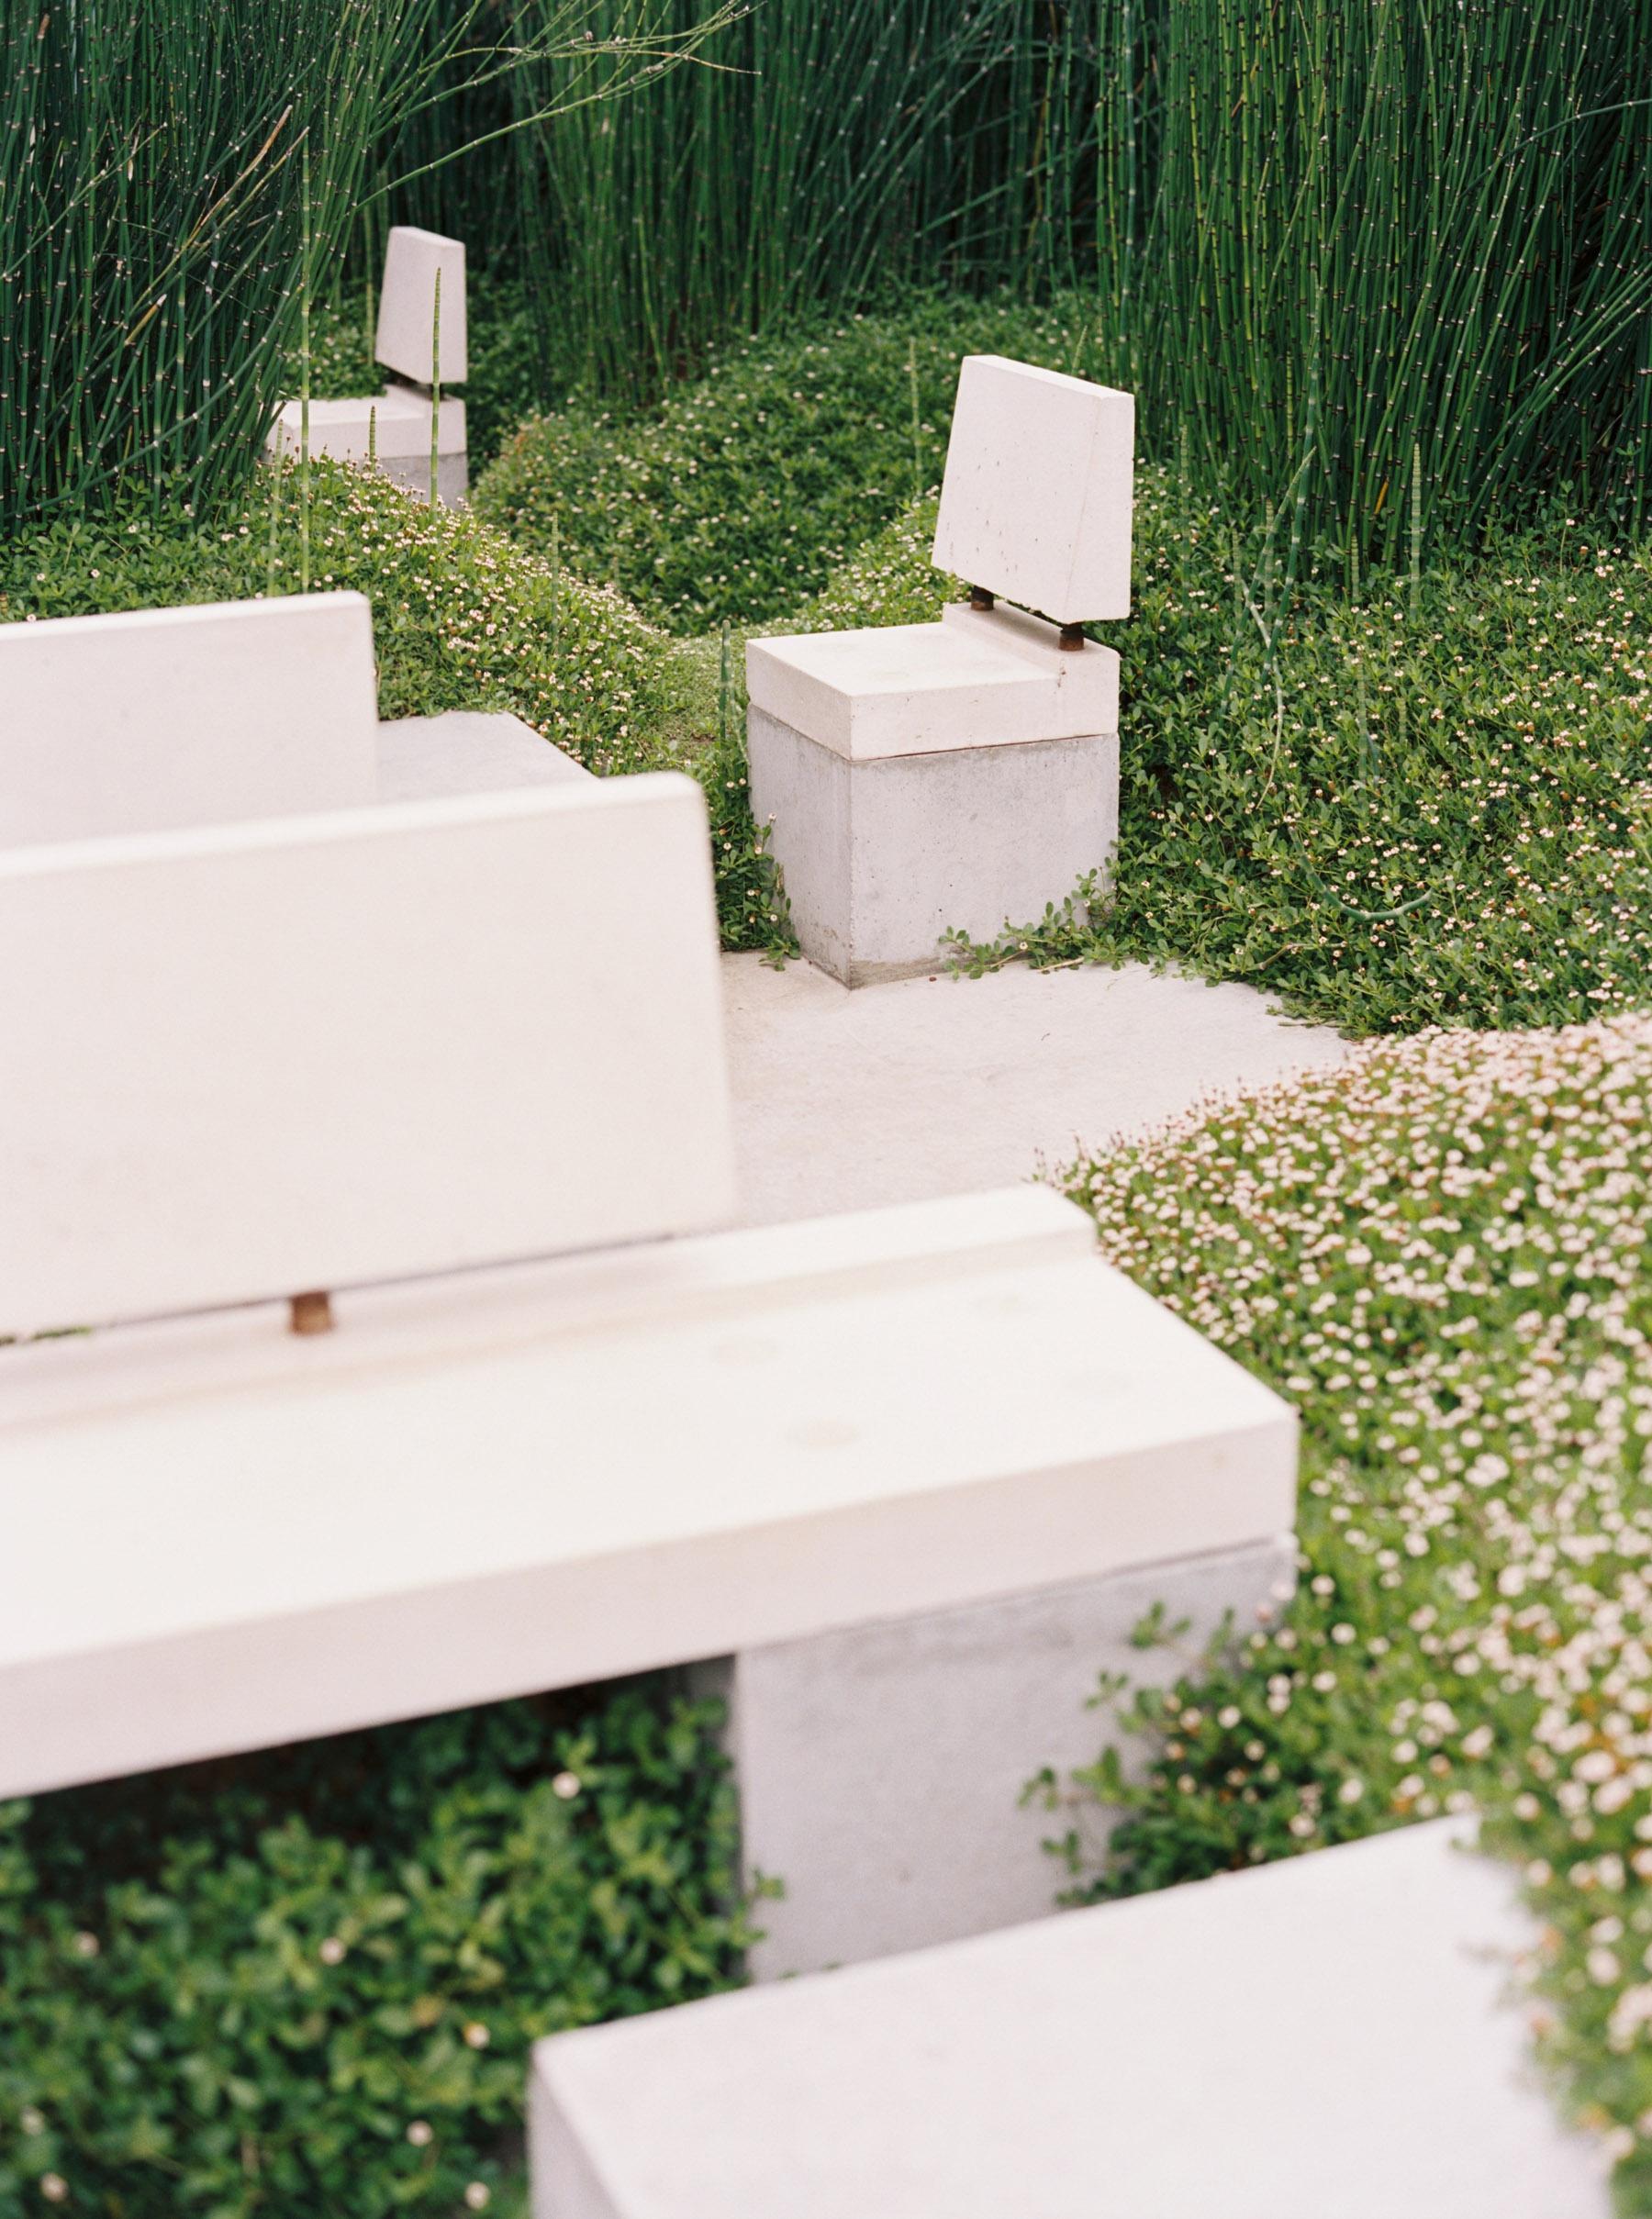 Vespertine, Openhouse, Los Angeles, California, Justin Chung, Jodan Kahn